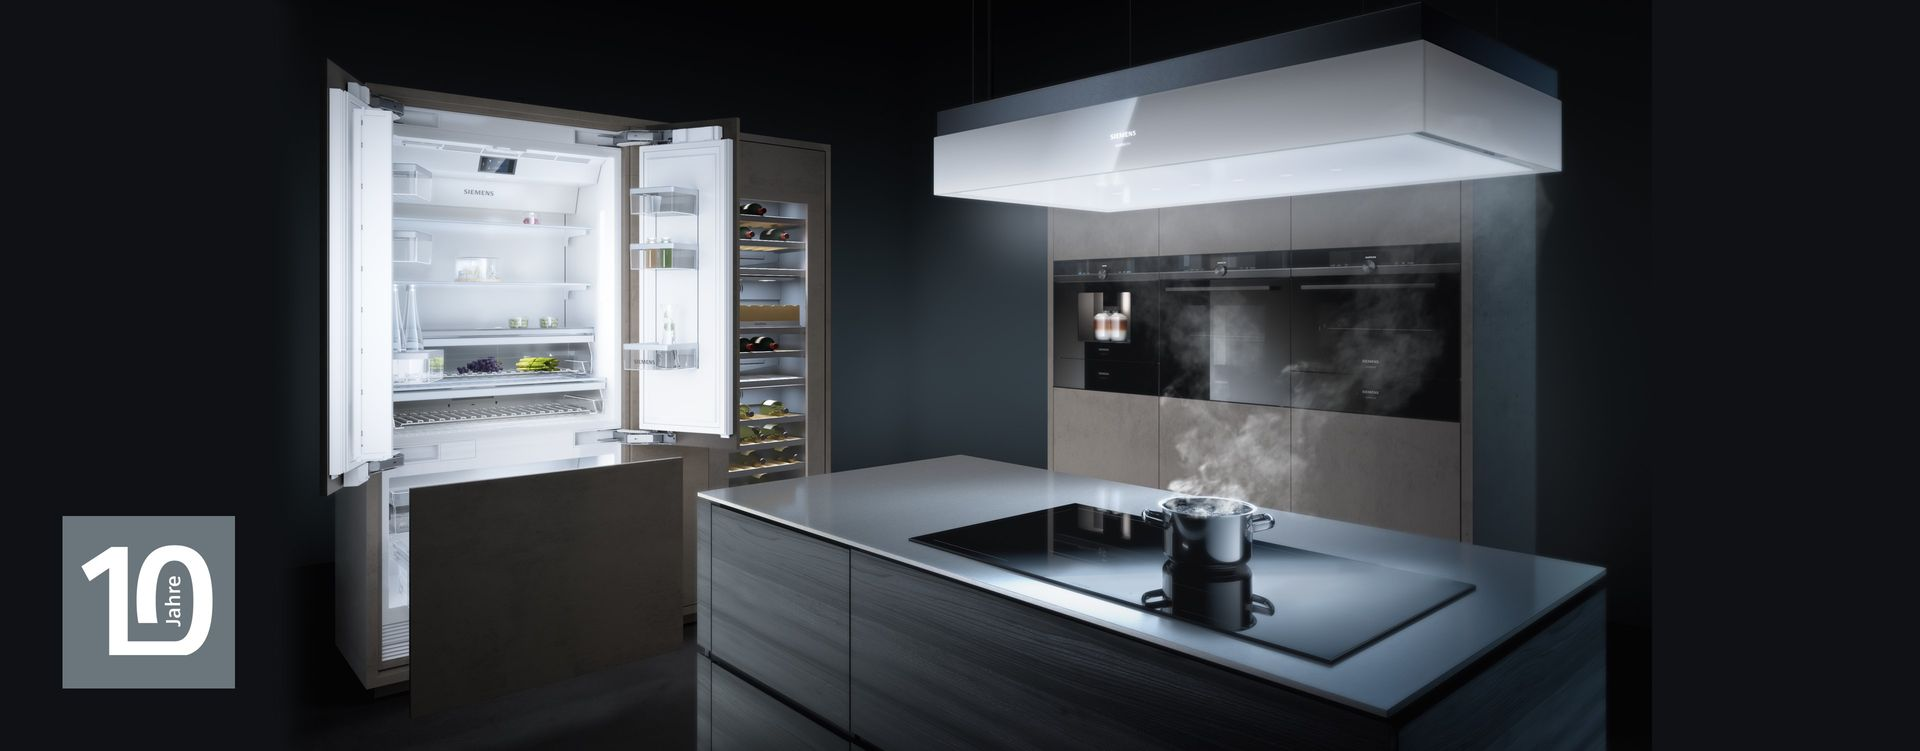 Siemens-Studioline-Bild-2020